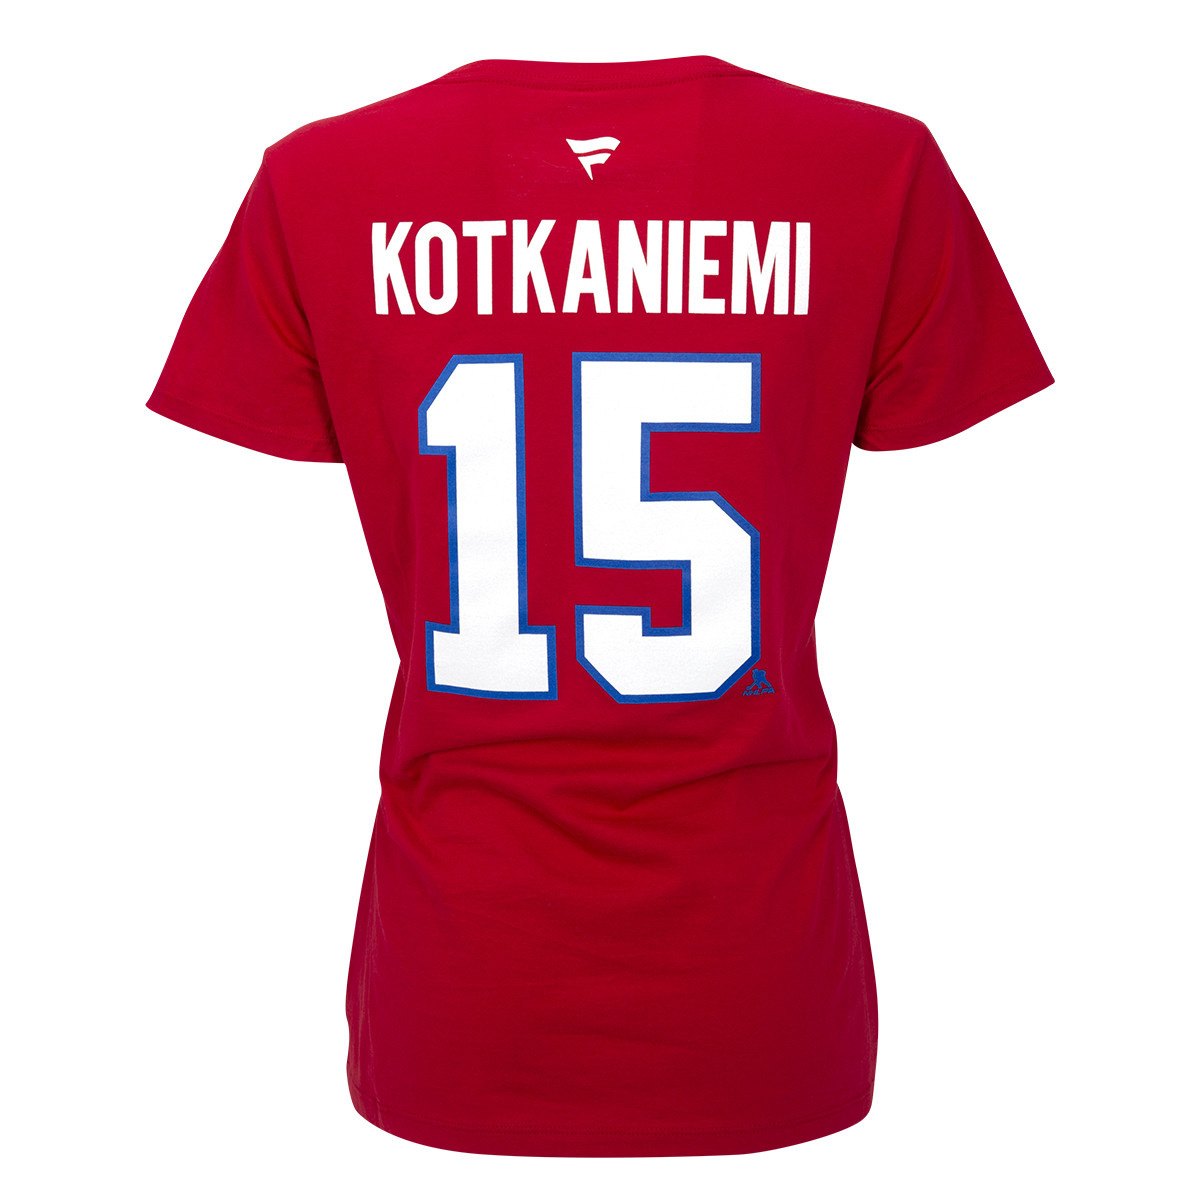 reputable site d64c3 6cb55 Women's #15 Jesperi Kotkaniemi Player T-shirt∣ Tricolore Sports